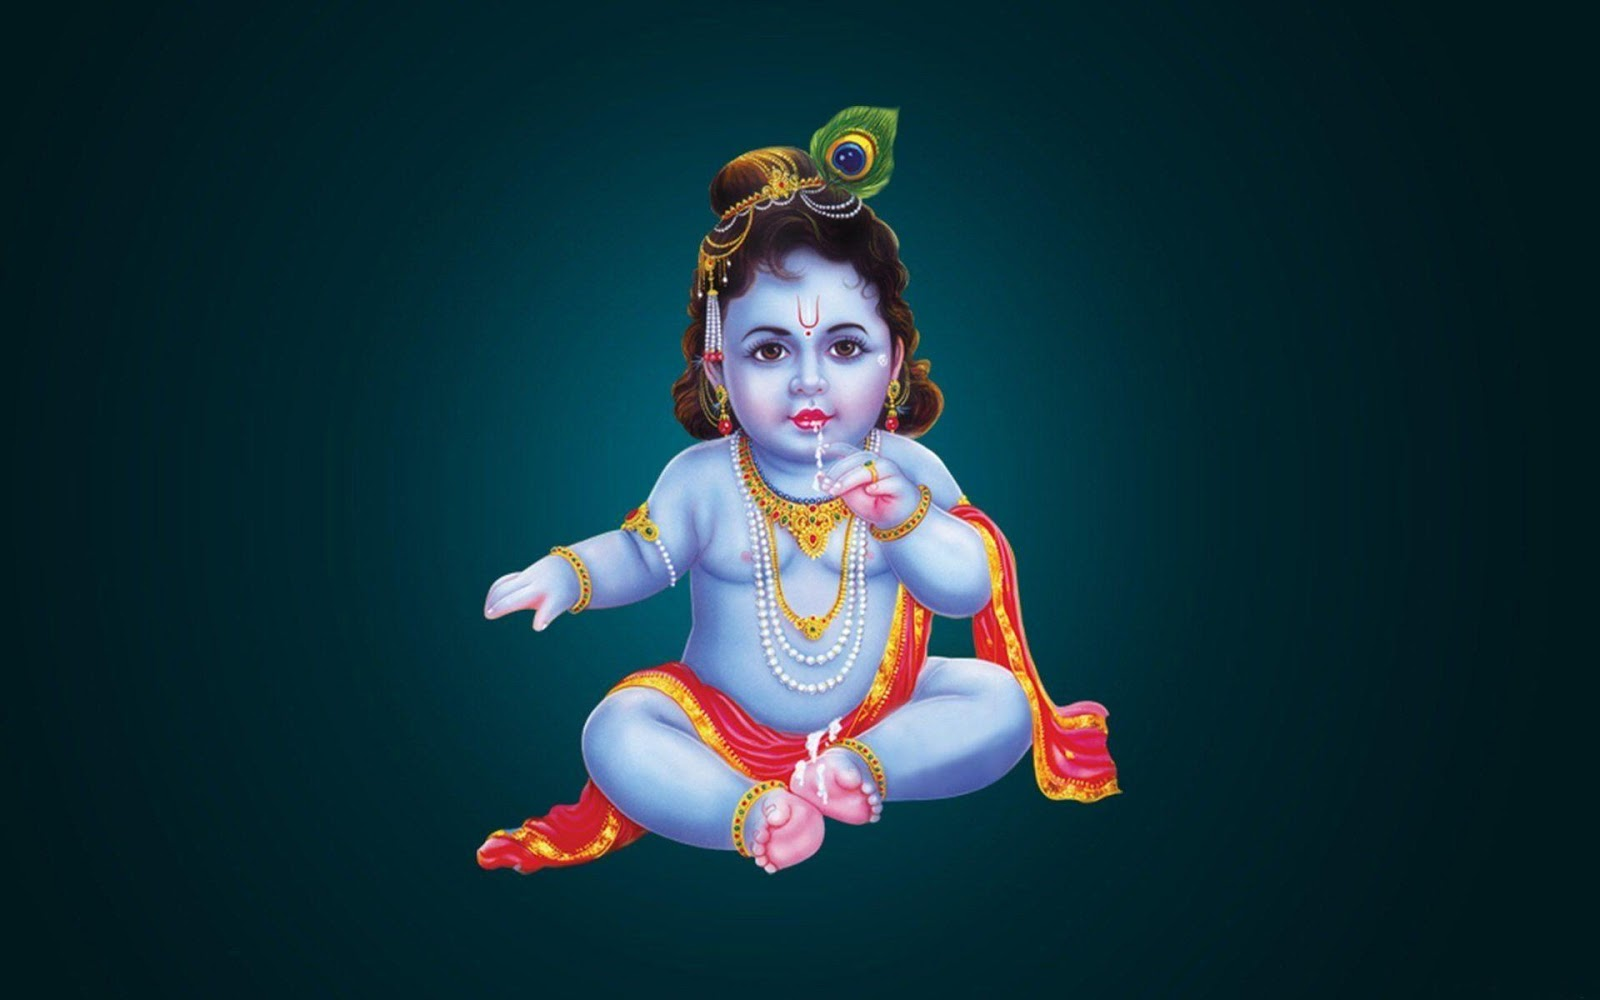 Little krishna wallpaper free download15